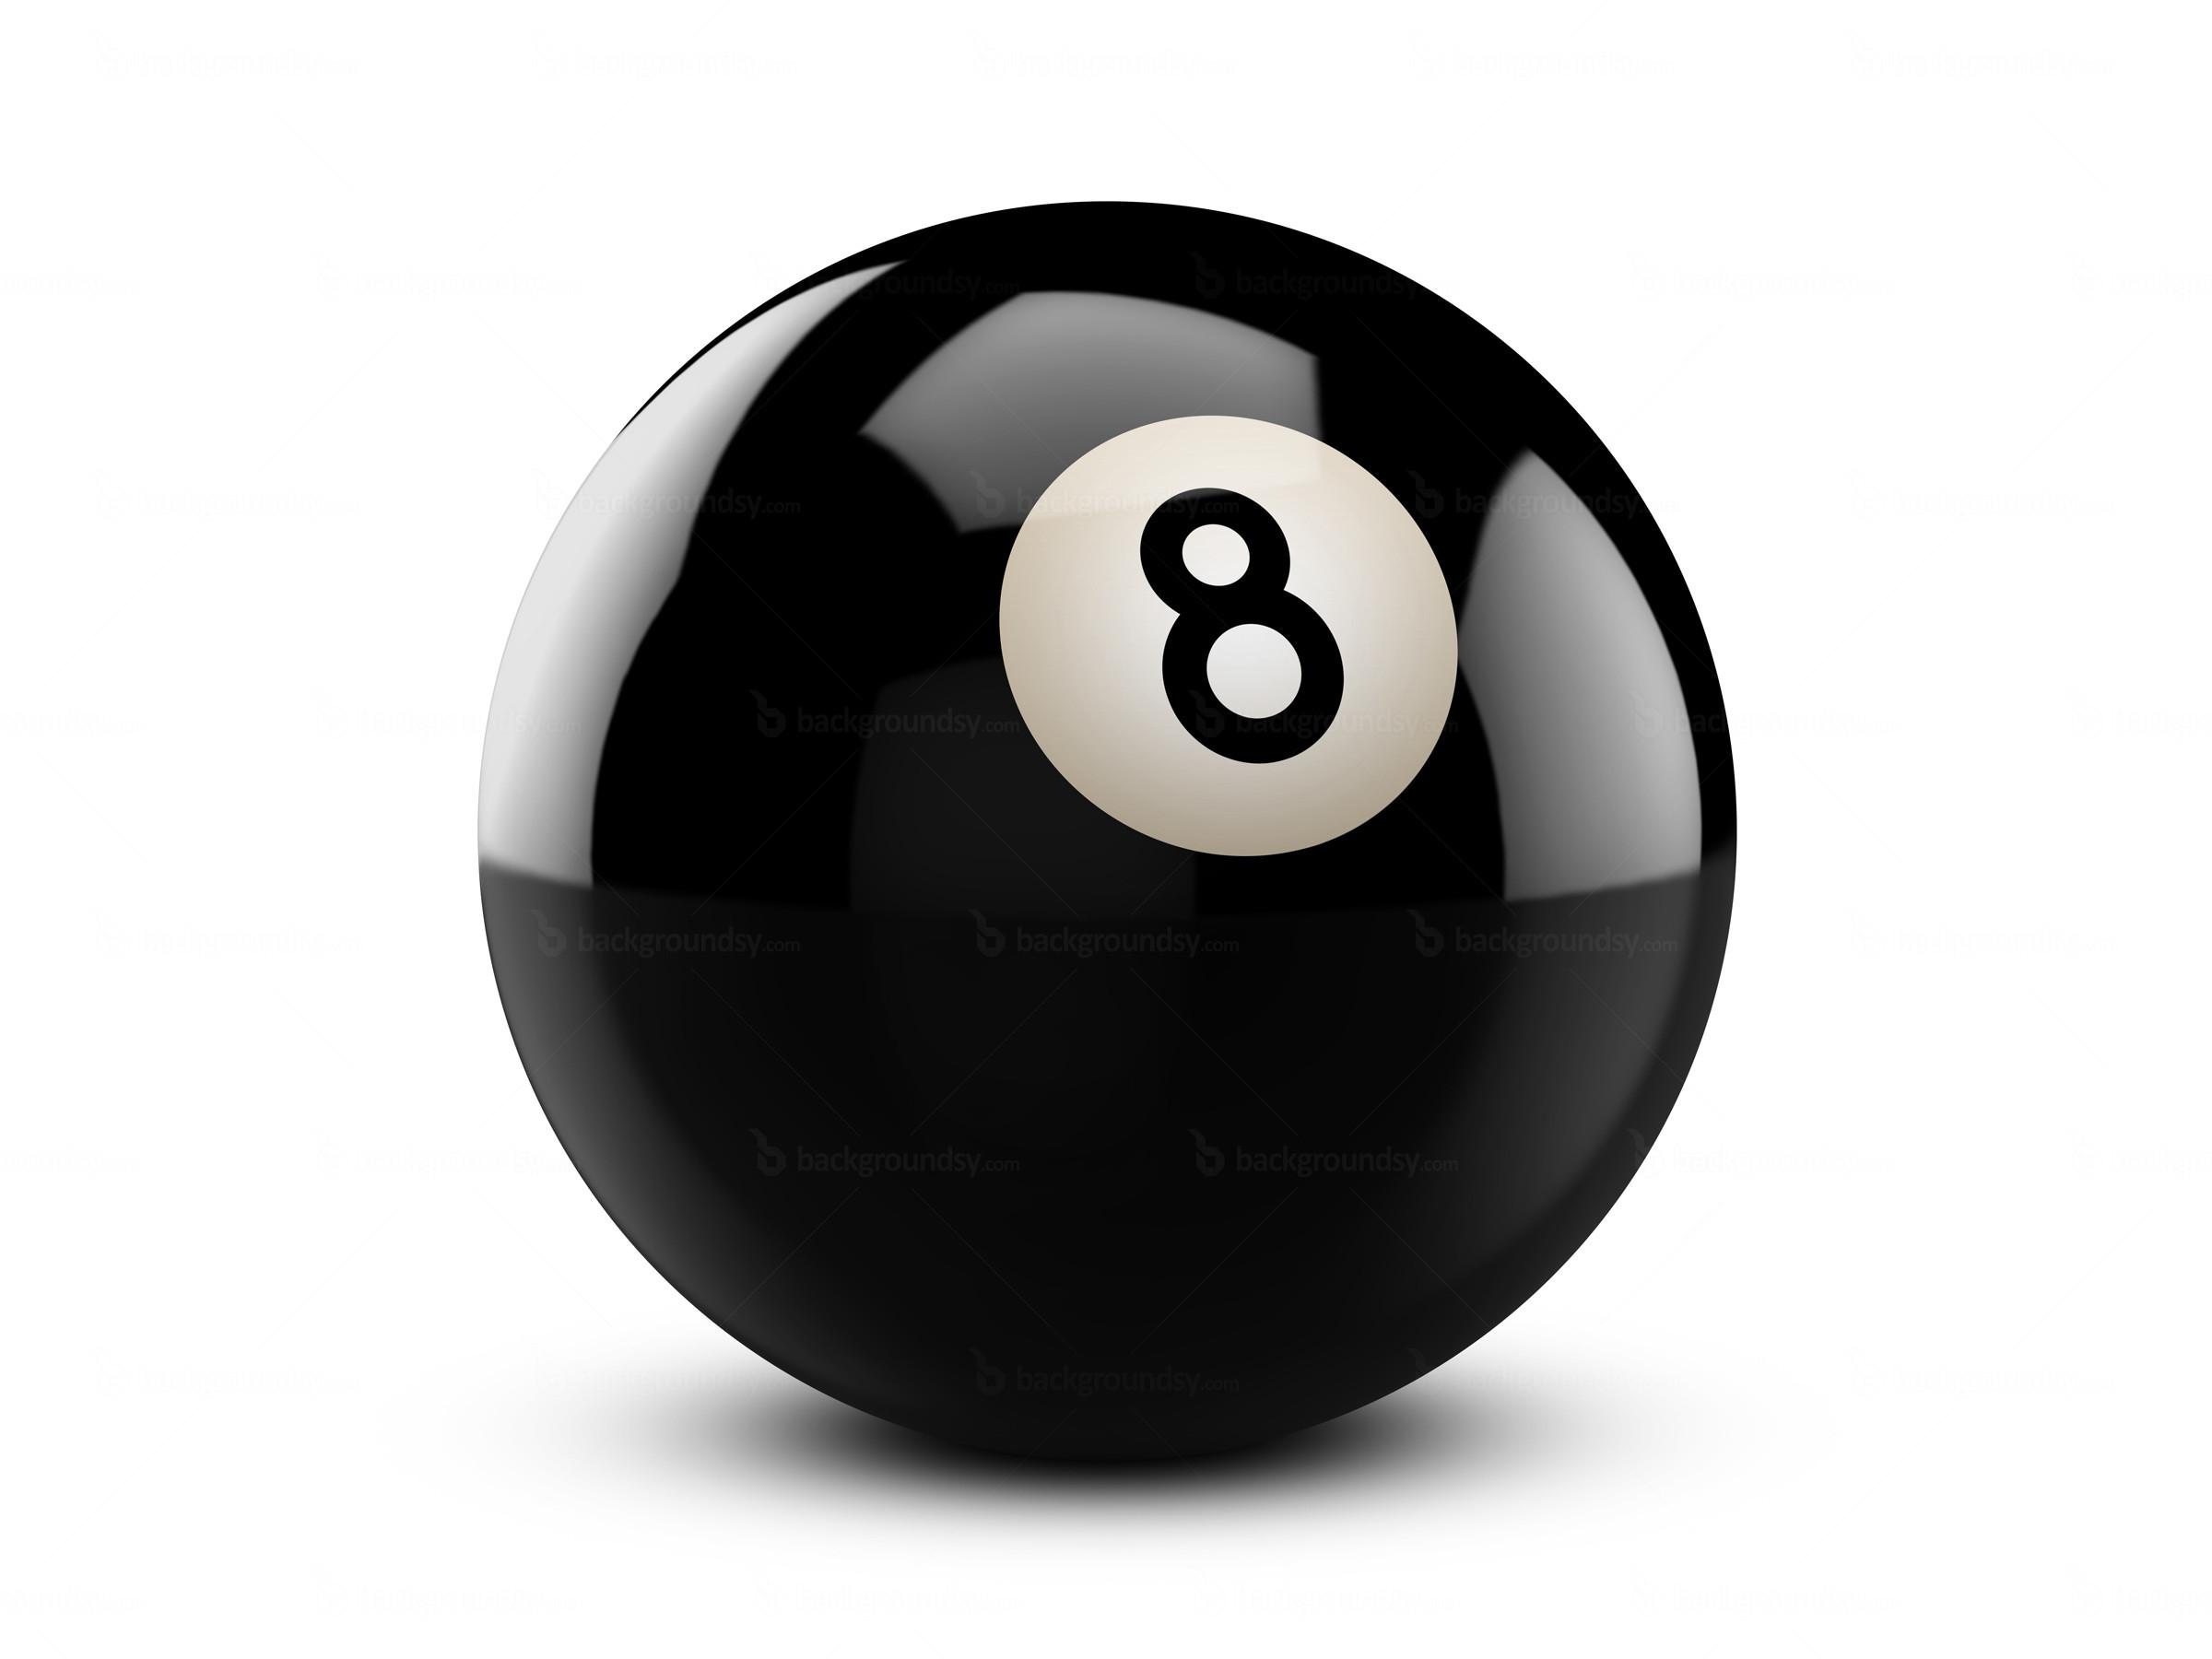 8 Ball Bool